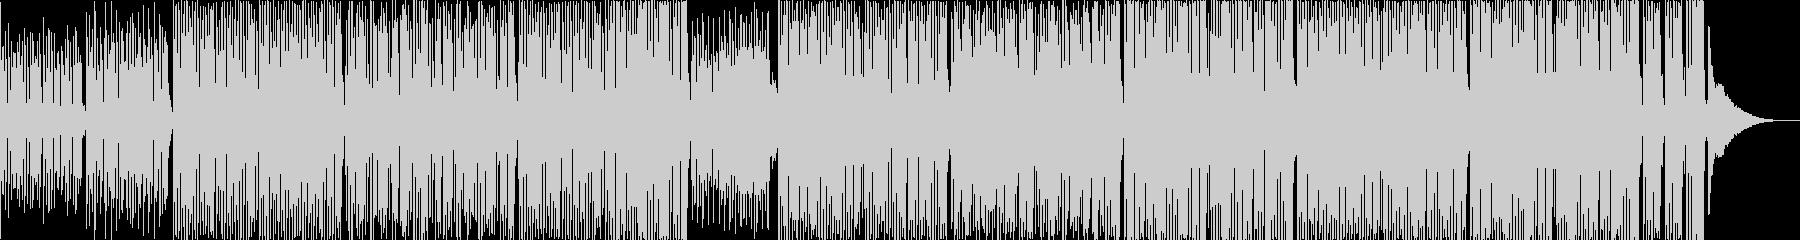 TikTokに元気で可愛い口笛トイピアノの未再生の波形